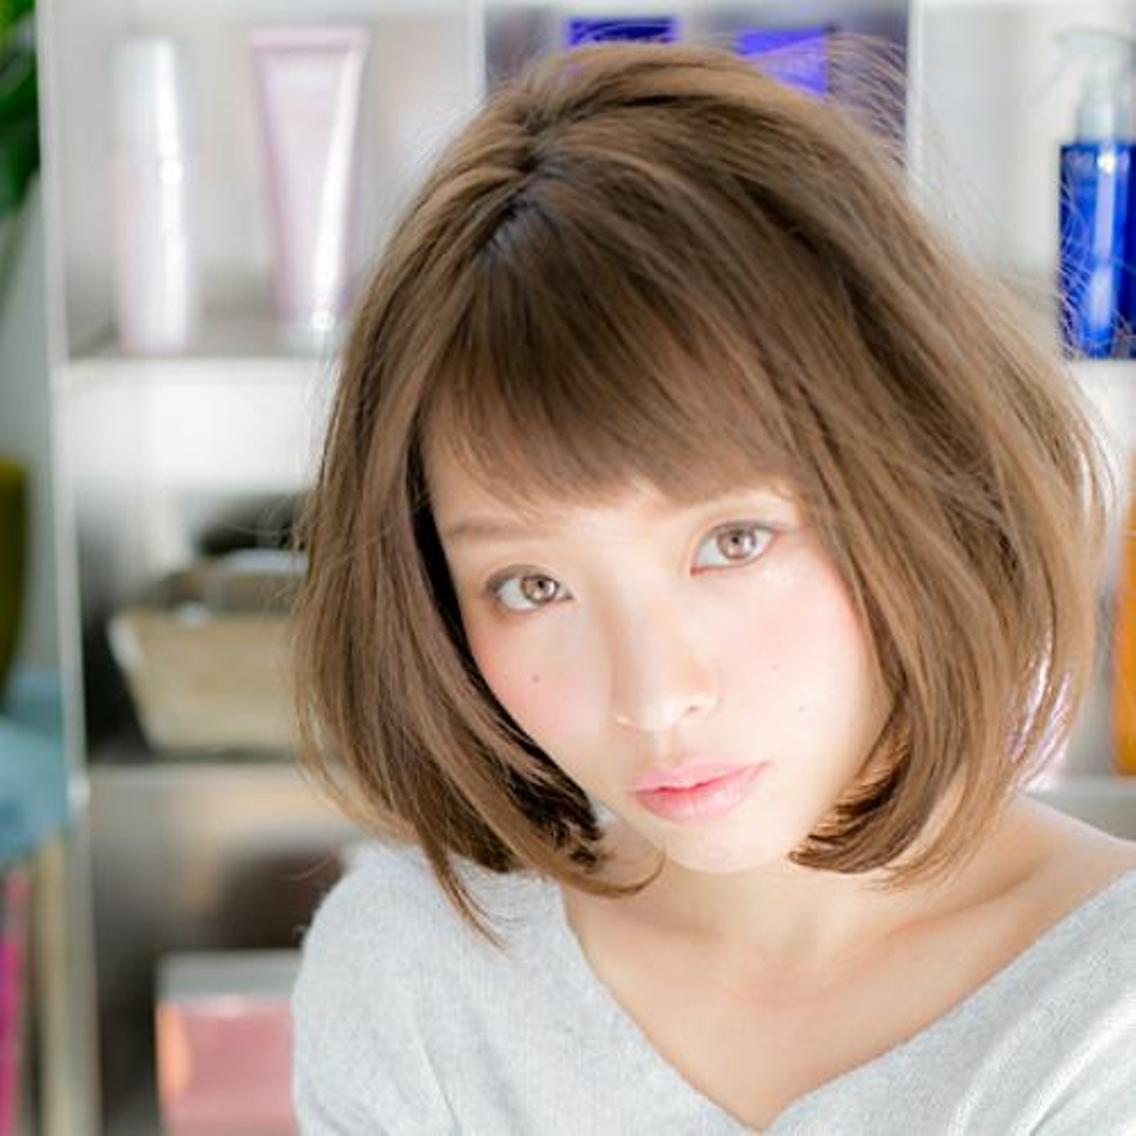 Personal Beauty Salon TRUTH 千葉そごう ジュンヌ館店所属・矢末 紗弥子の掲載